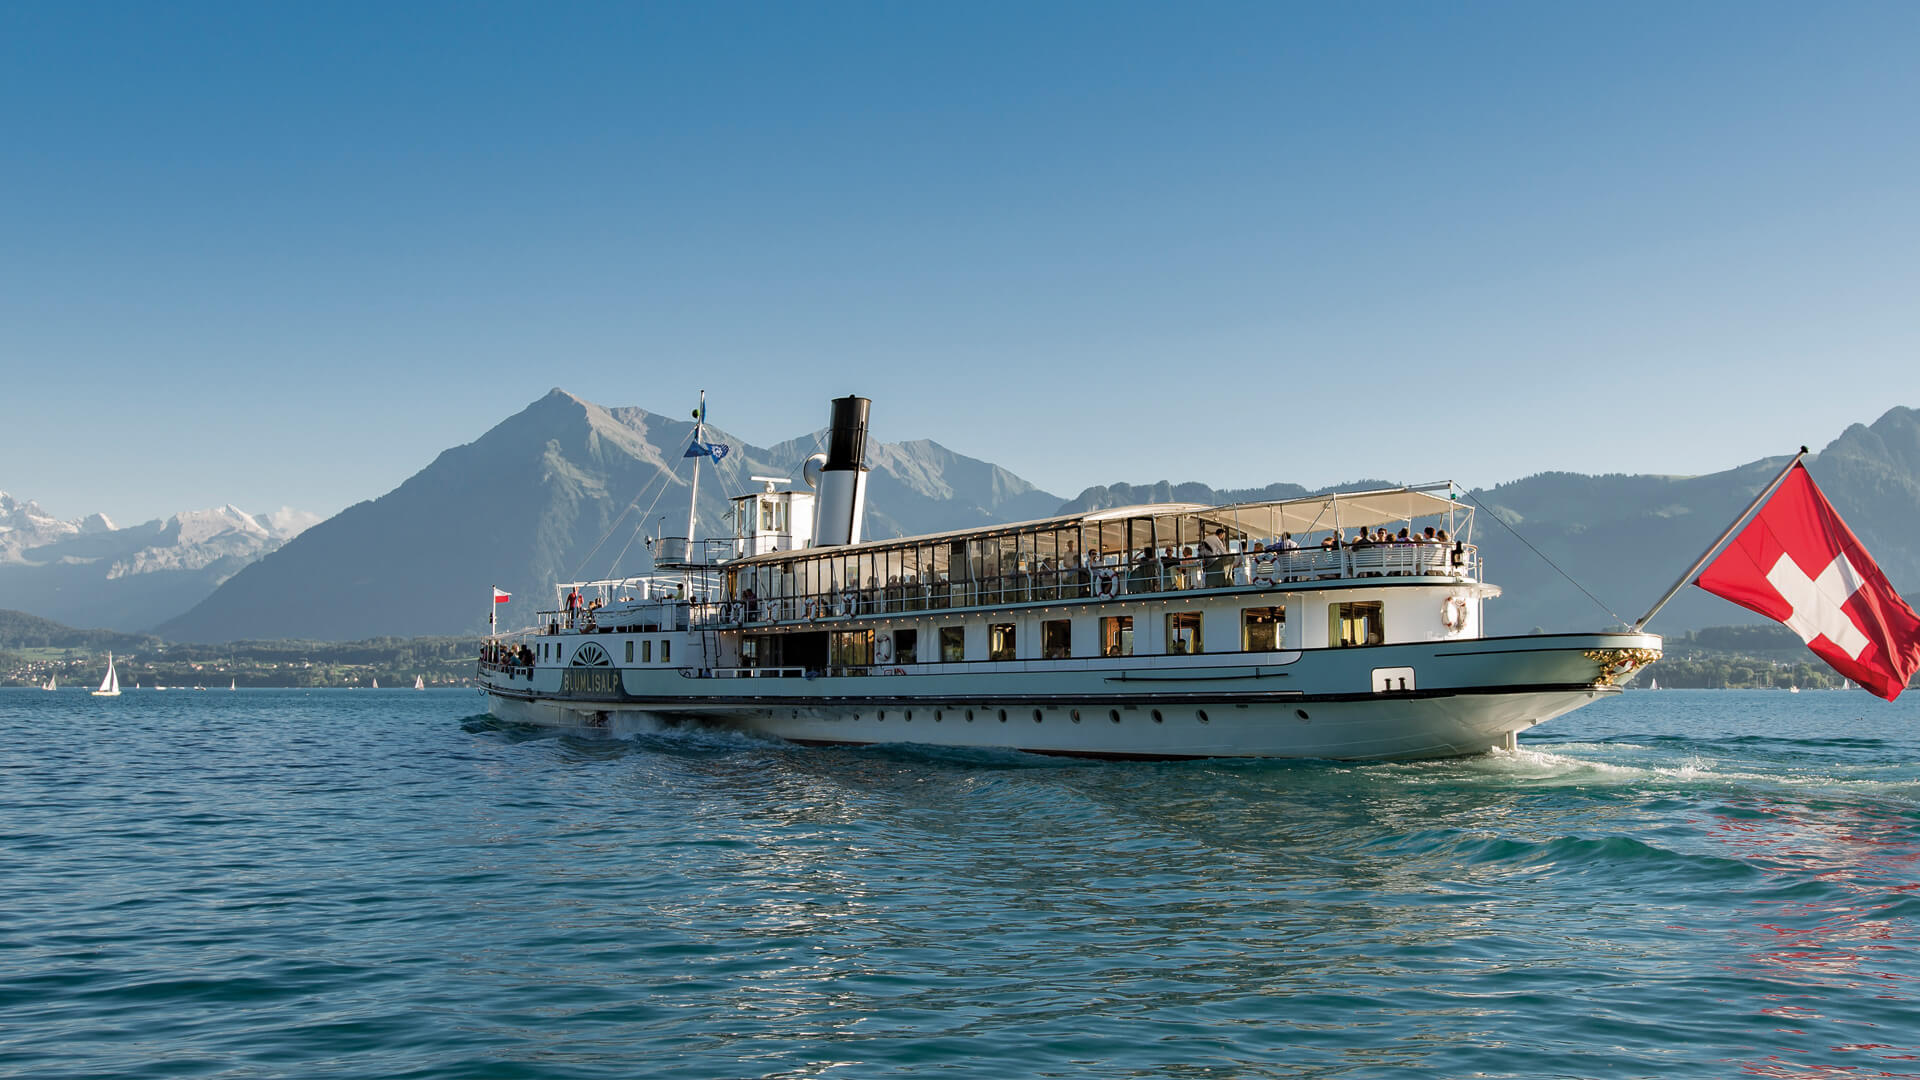 thunersee-schifffahrt-bluemlisalp-sommer-niesen